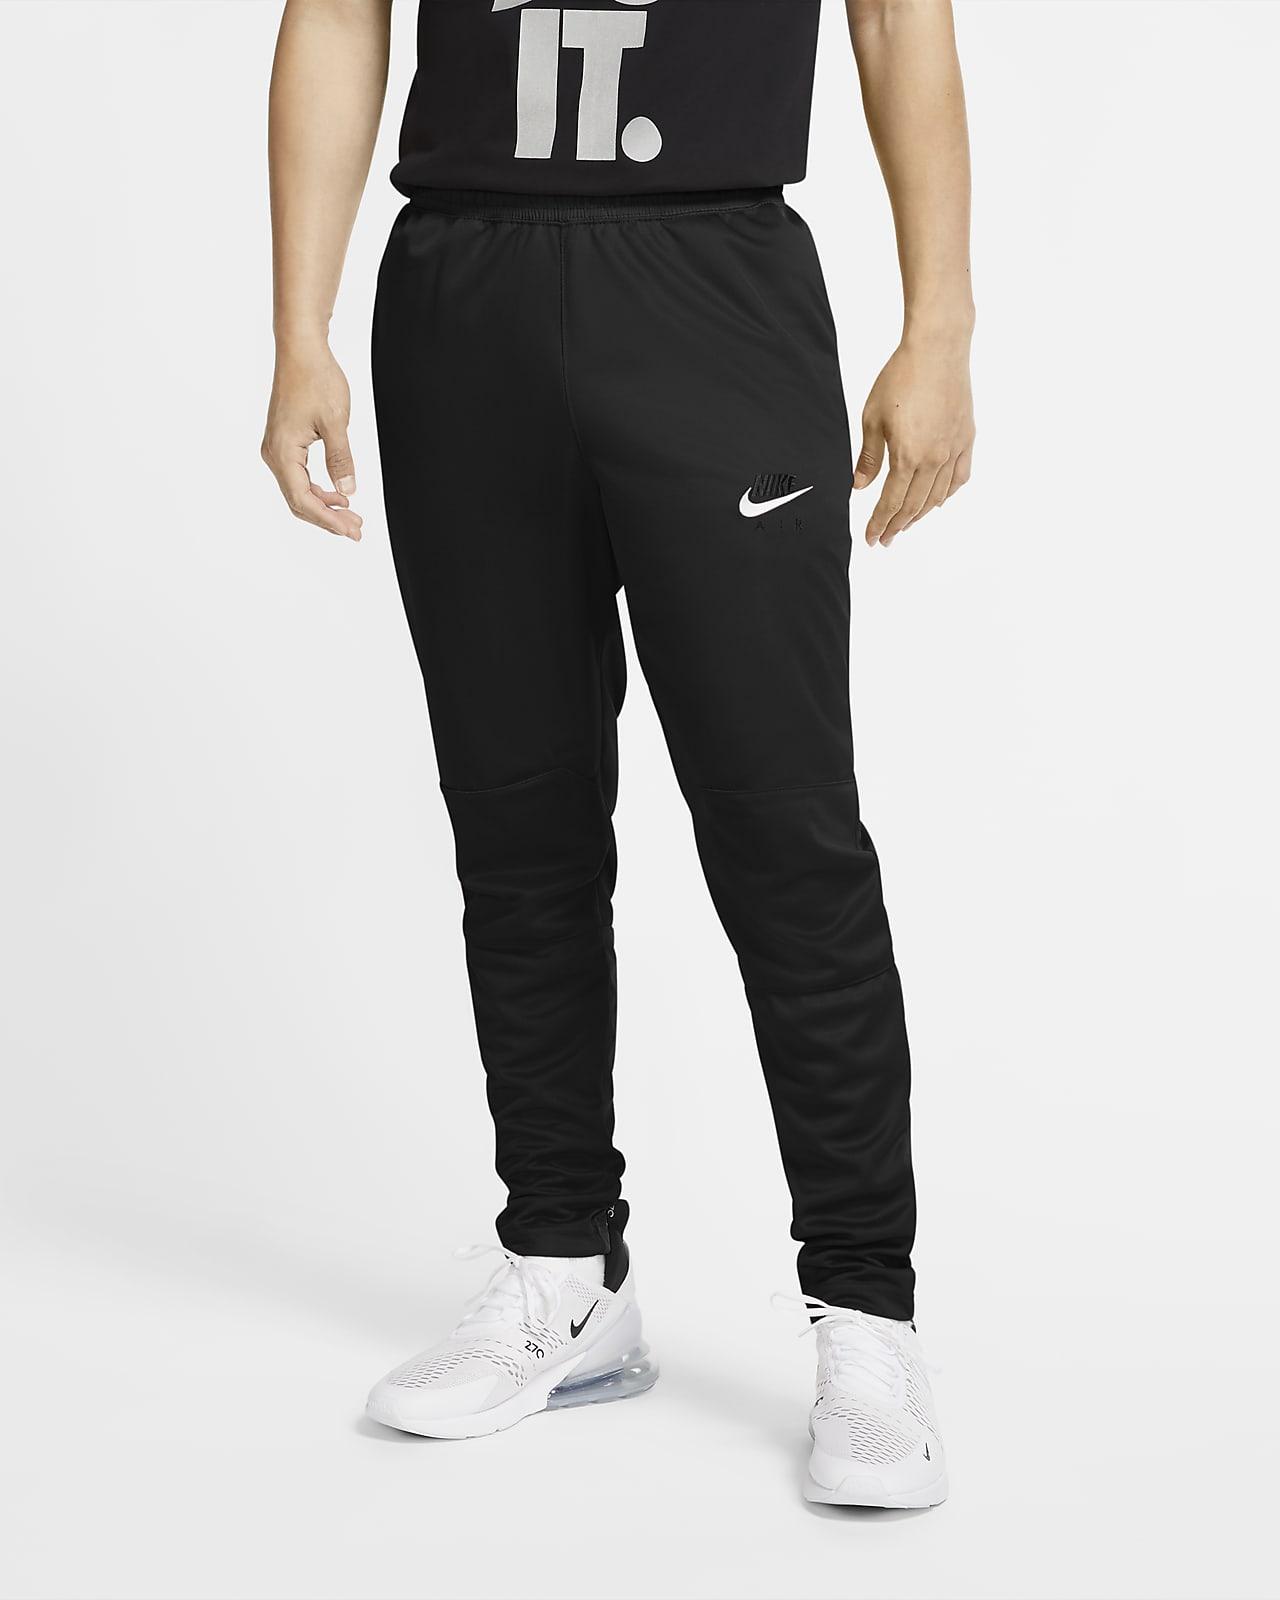 Nike Air Erkek Eşofman Altı